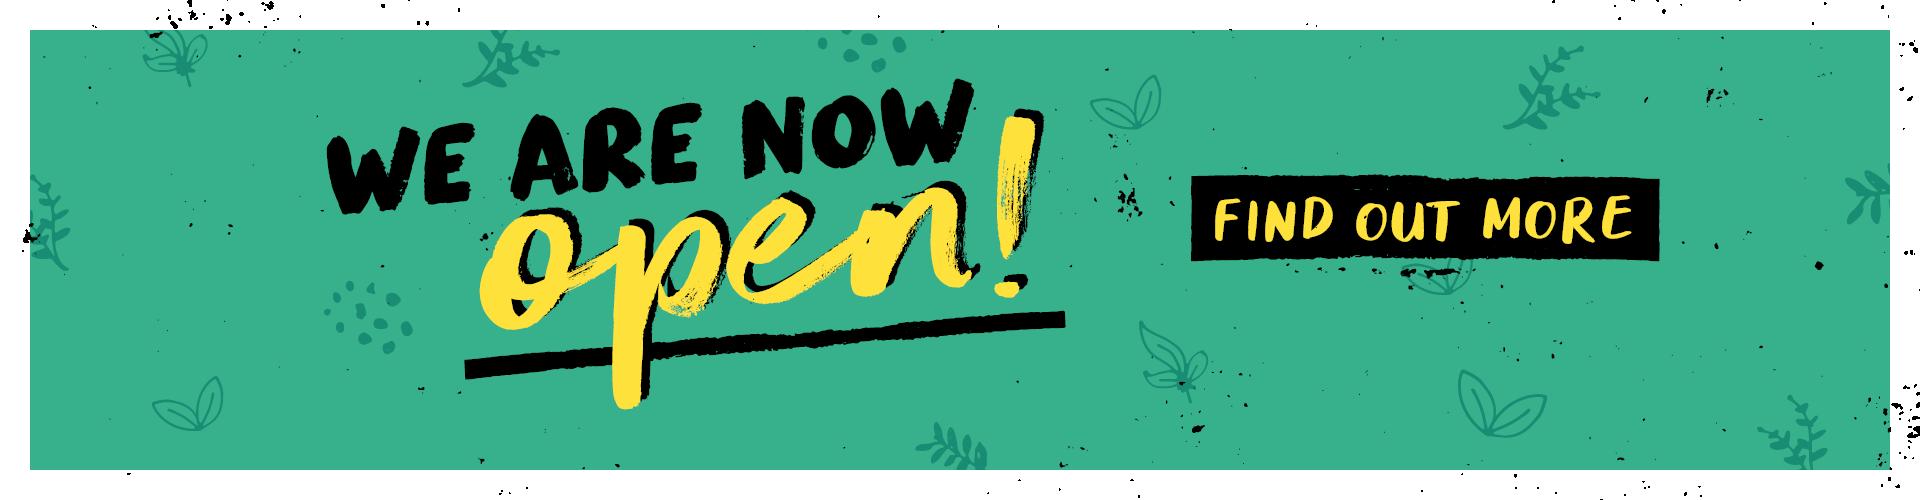 Scottish sites now open